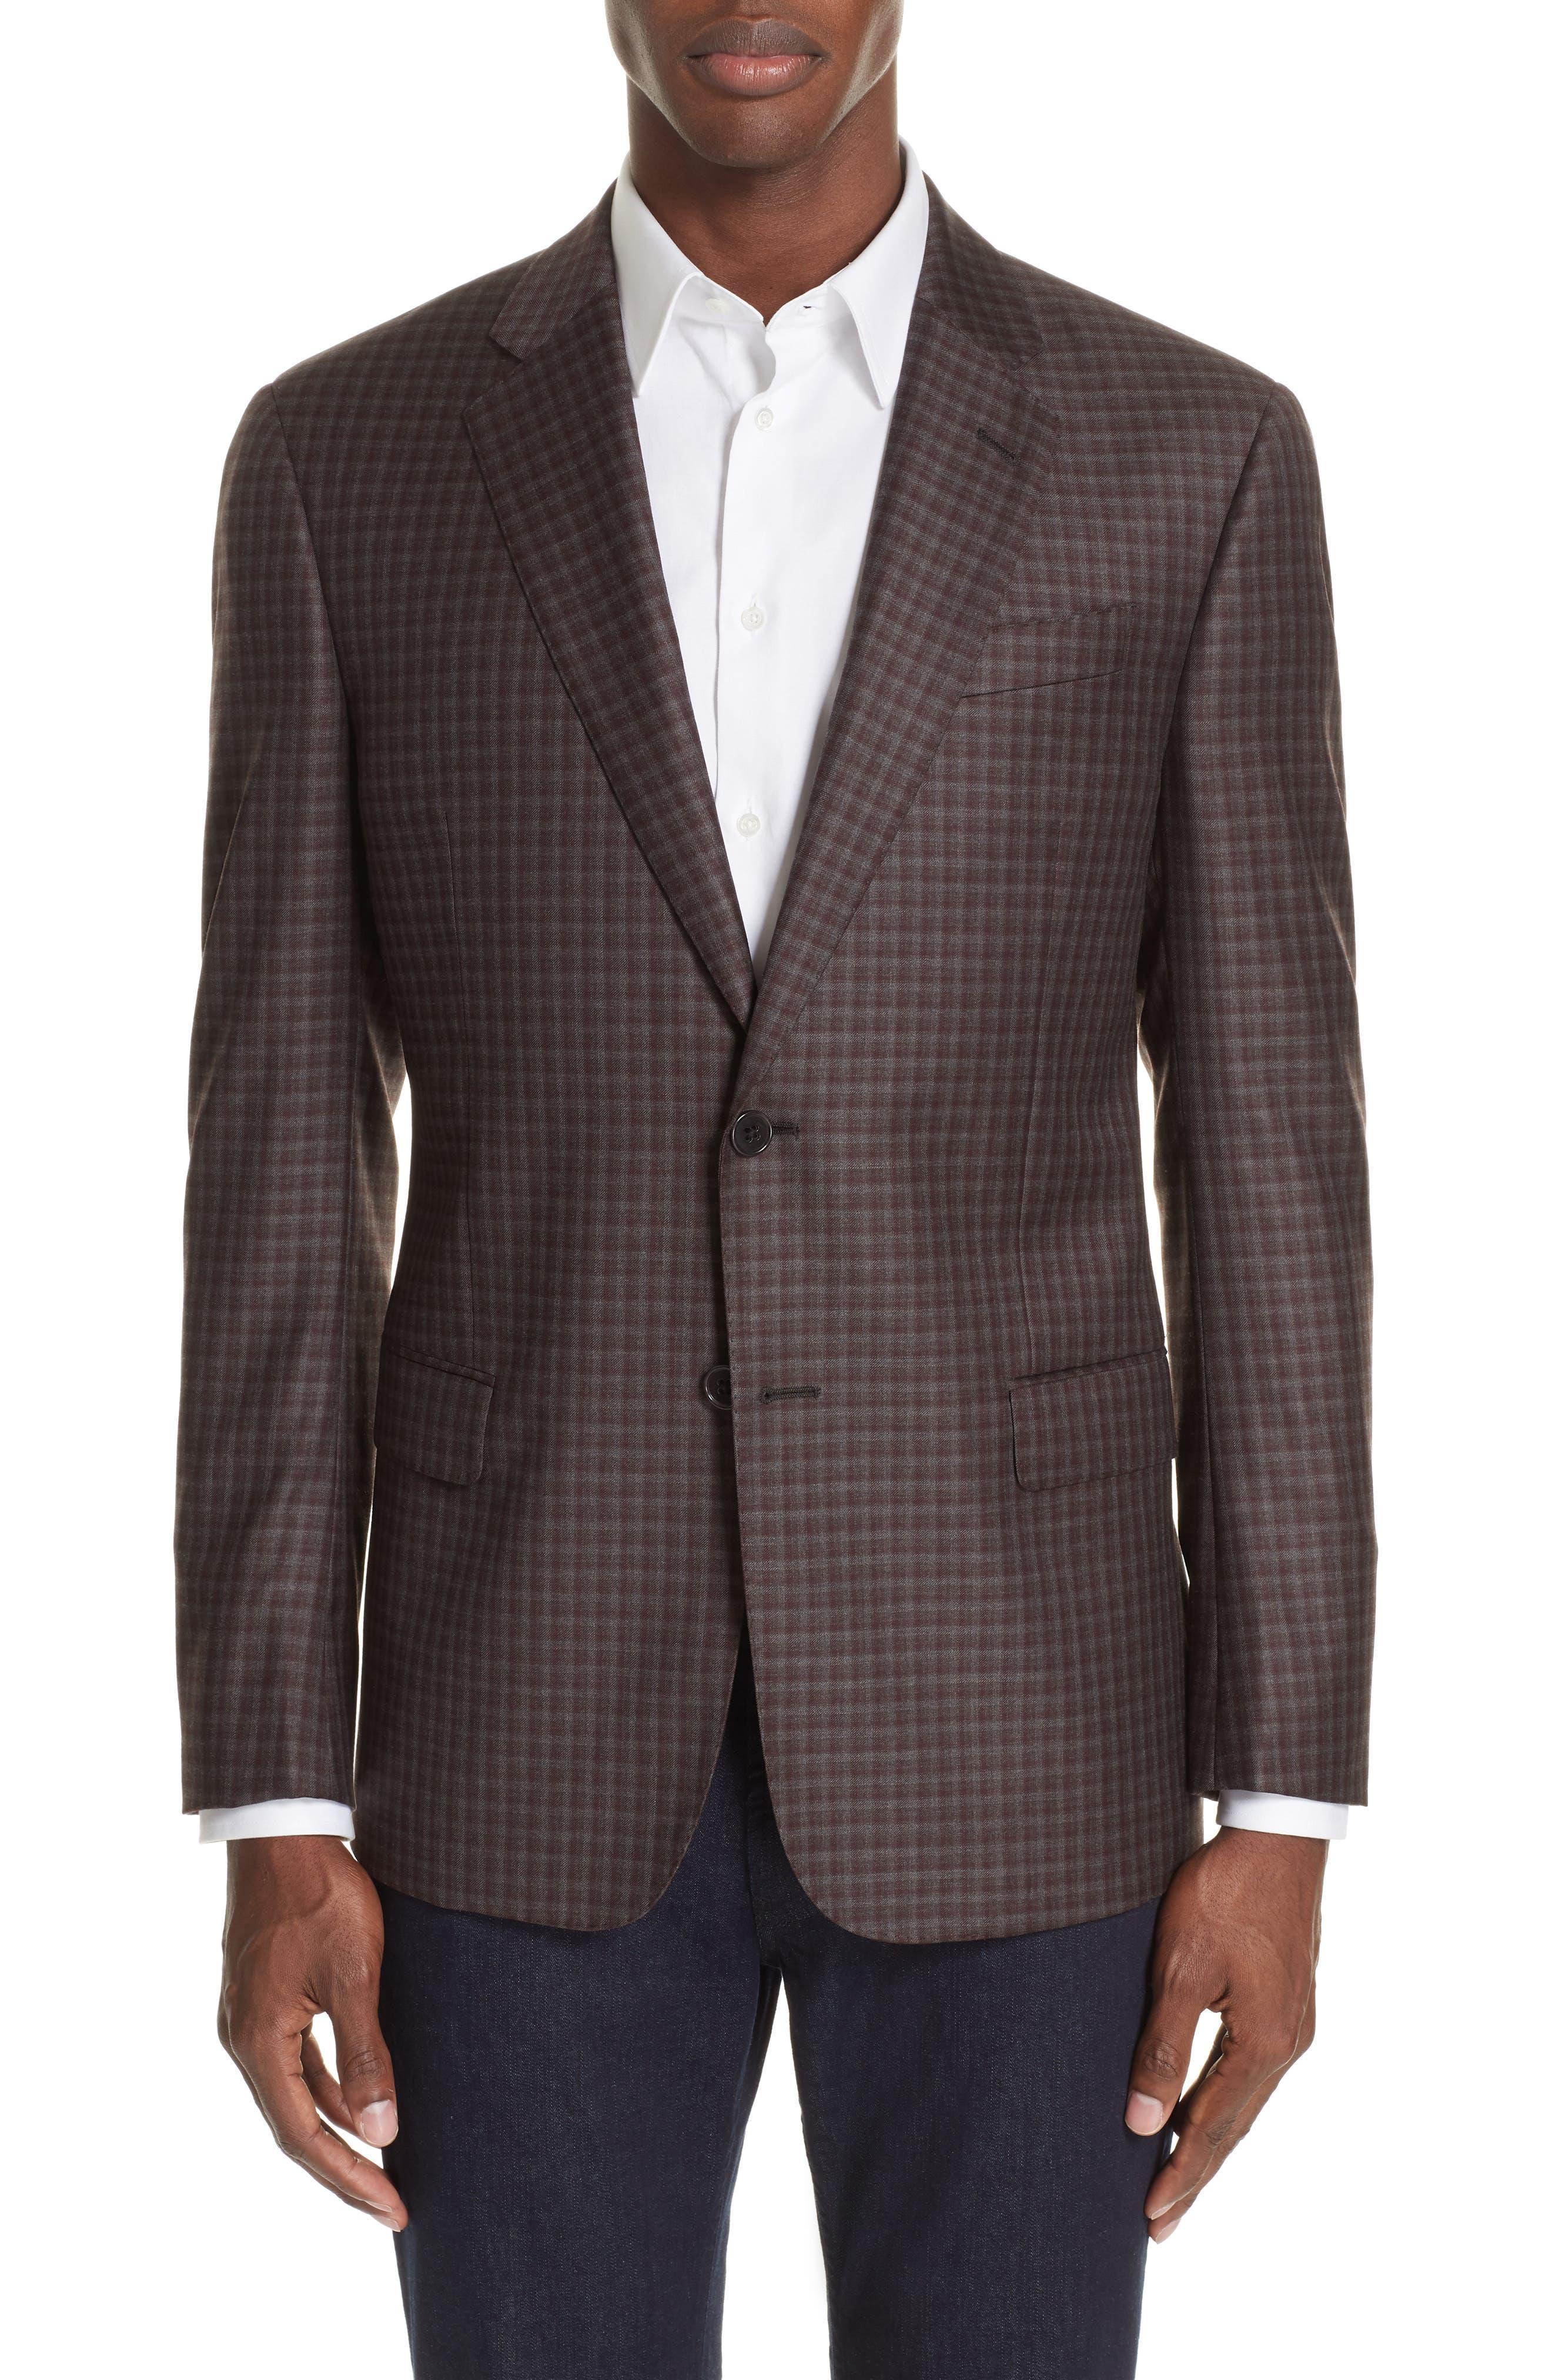 G-Line Trim Fit Plaid Wool Sport Coat,                             Main thumbnail 1, color,                             RED/ BROWN